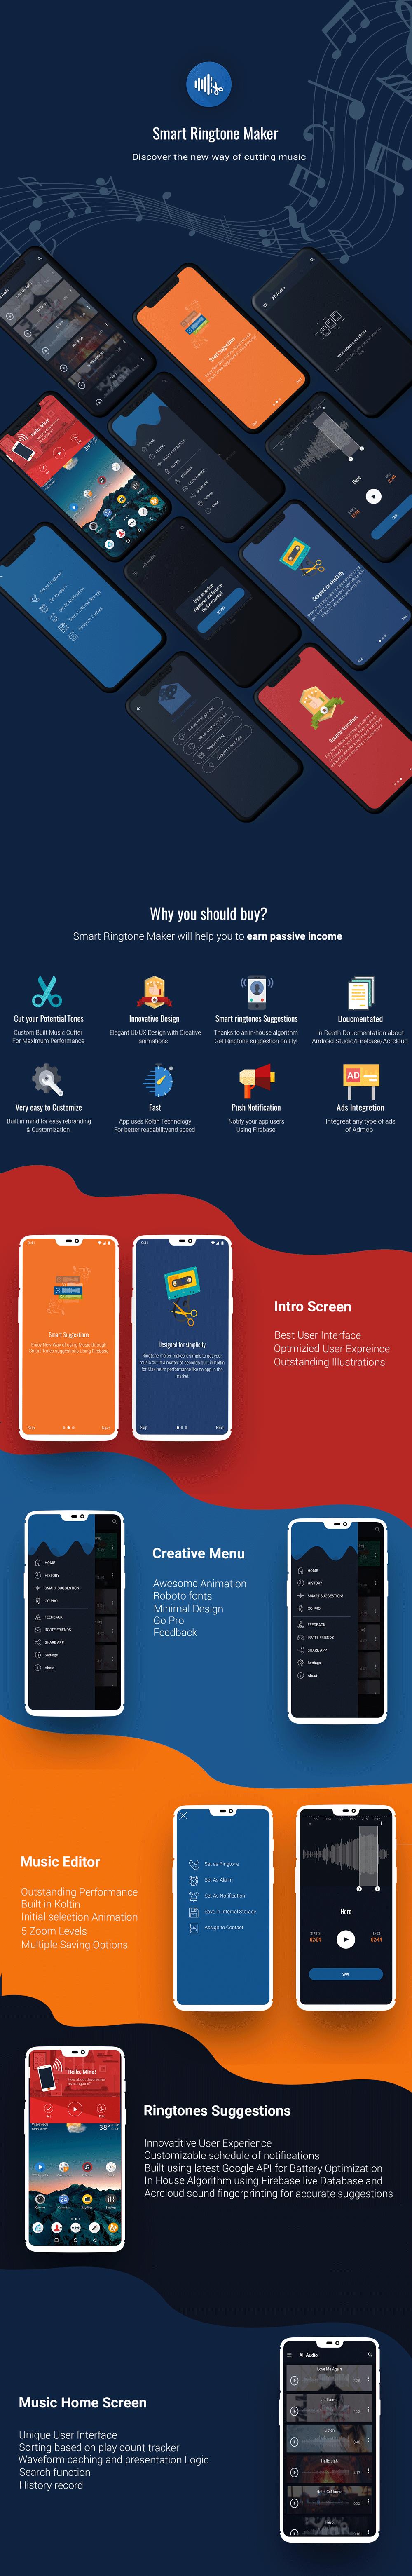 Smart Ringtone Maker App Buy